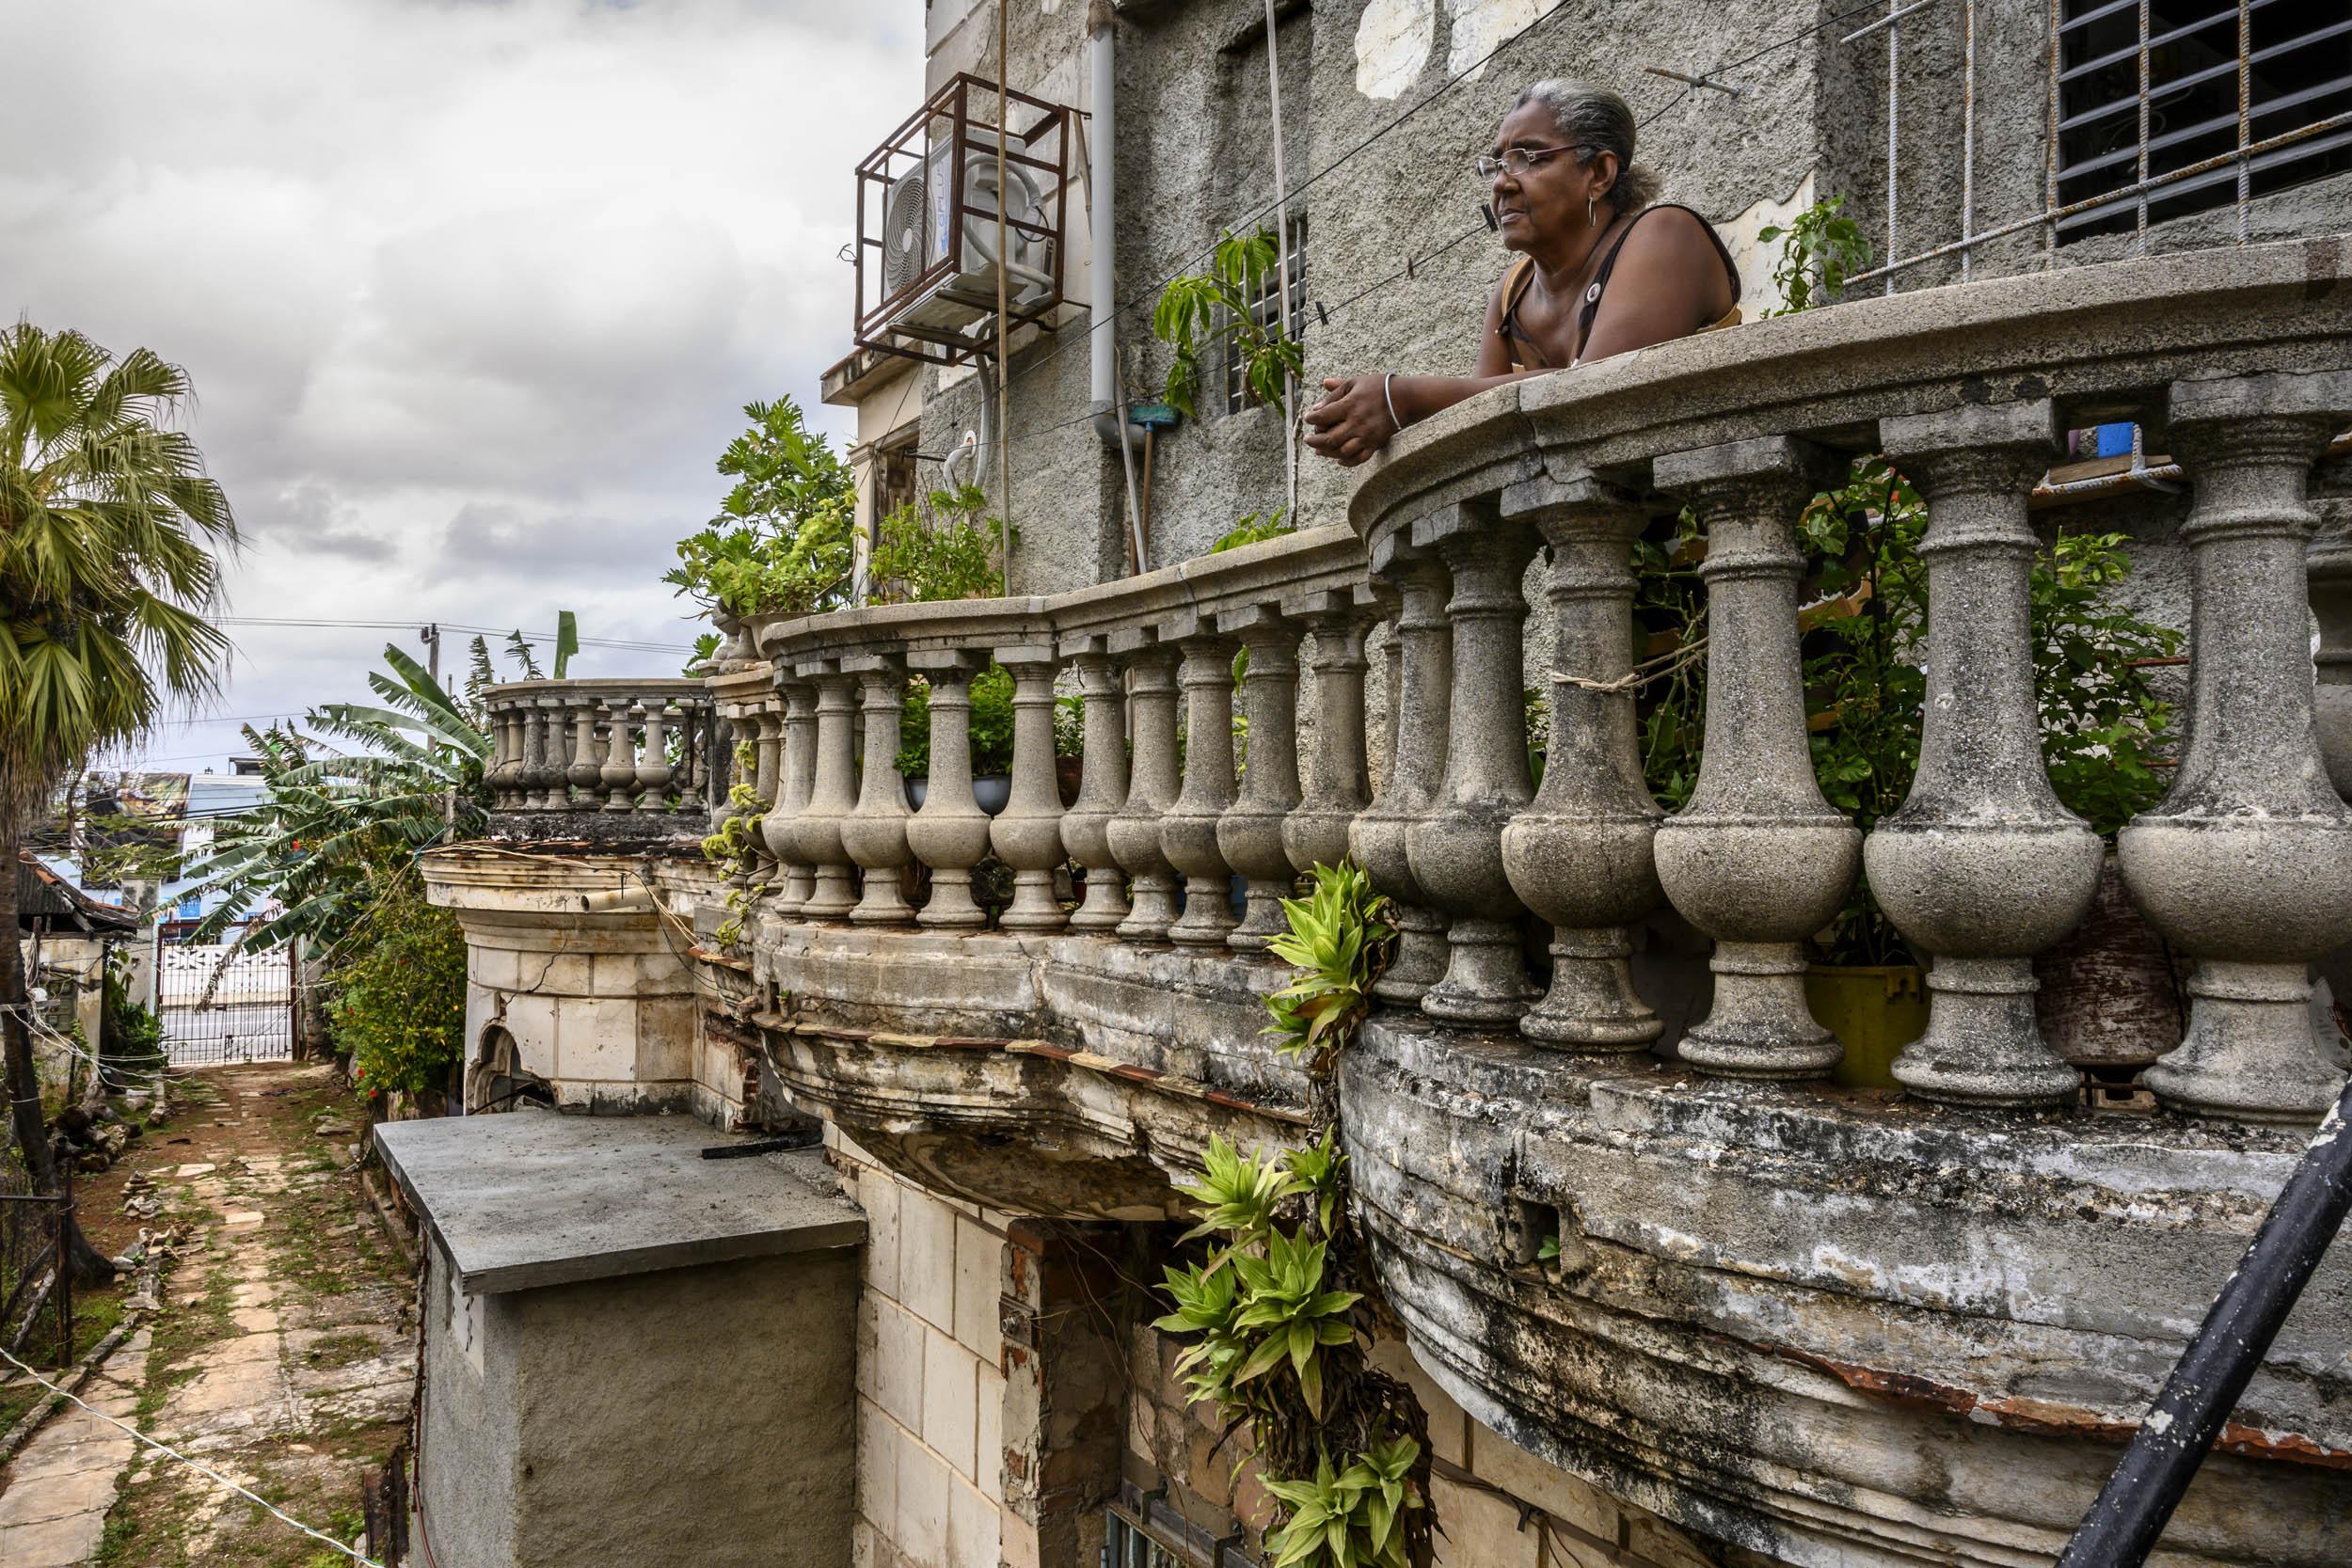 Loynaz - Cuba - Hector Garrido, Aerial and human photography